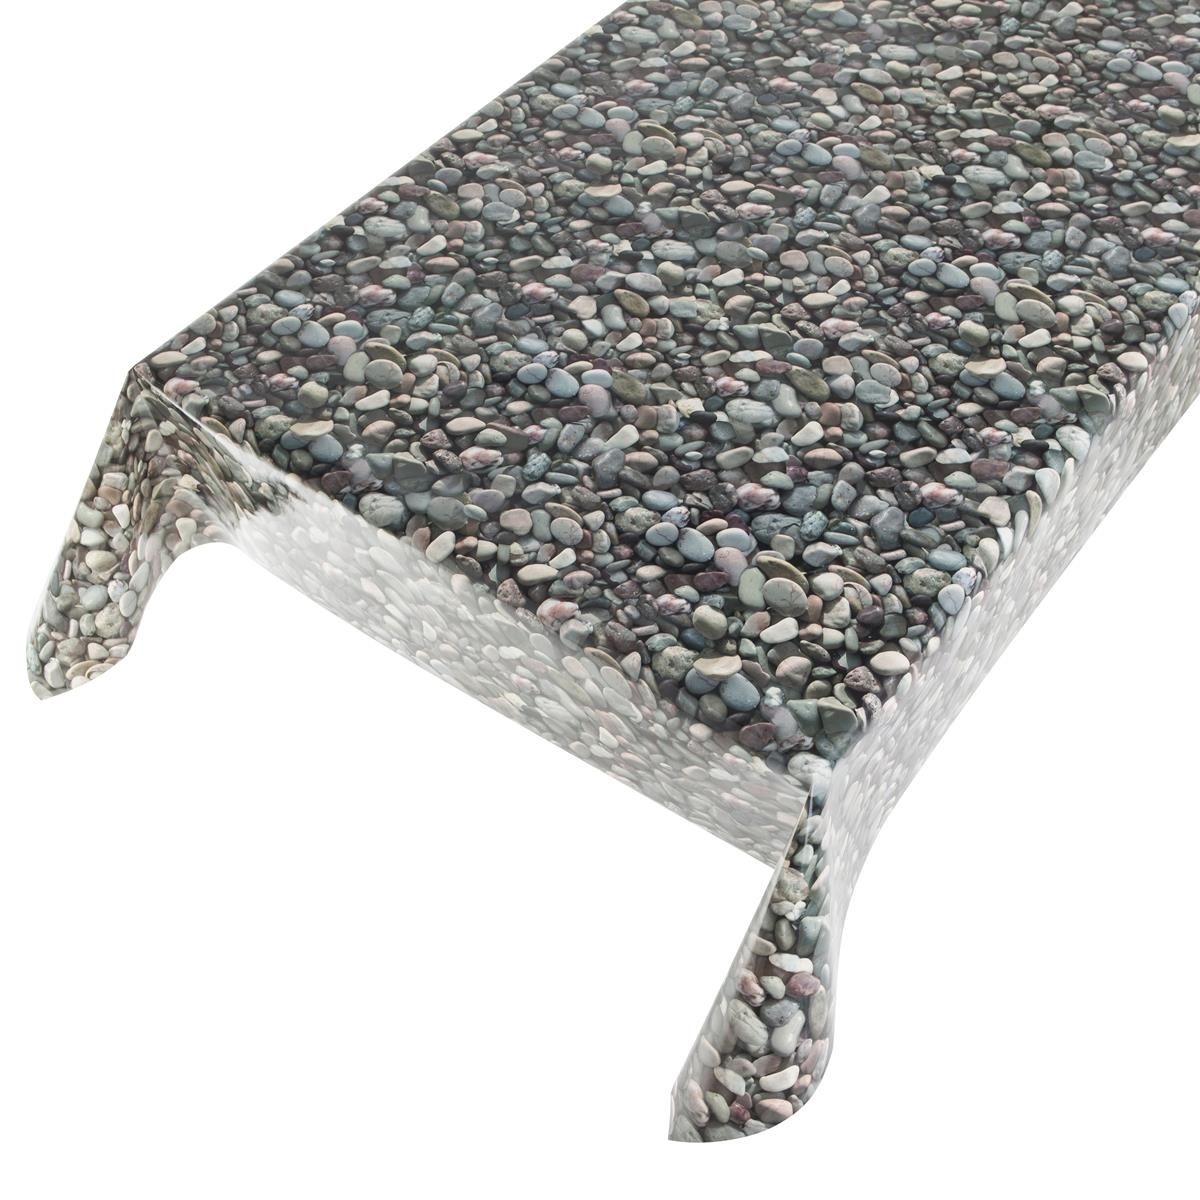 wachstuch in 1 4m br stones meterware outdoor. Black Bedroom Furniture Sets. Home Design Ideas